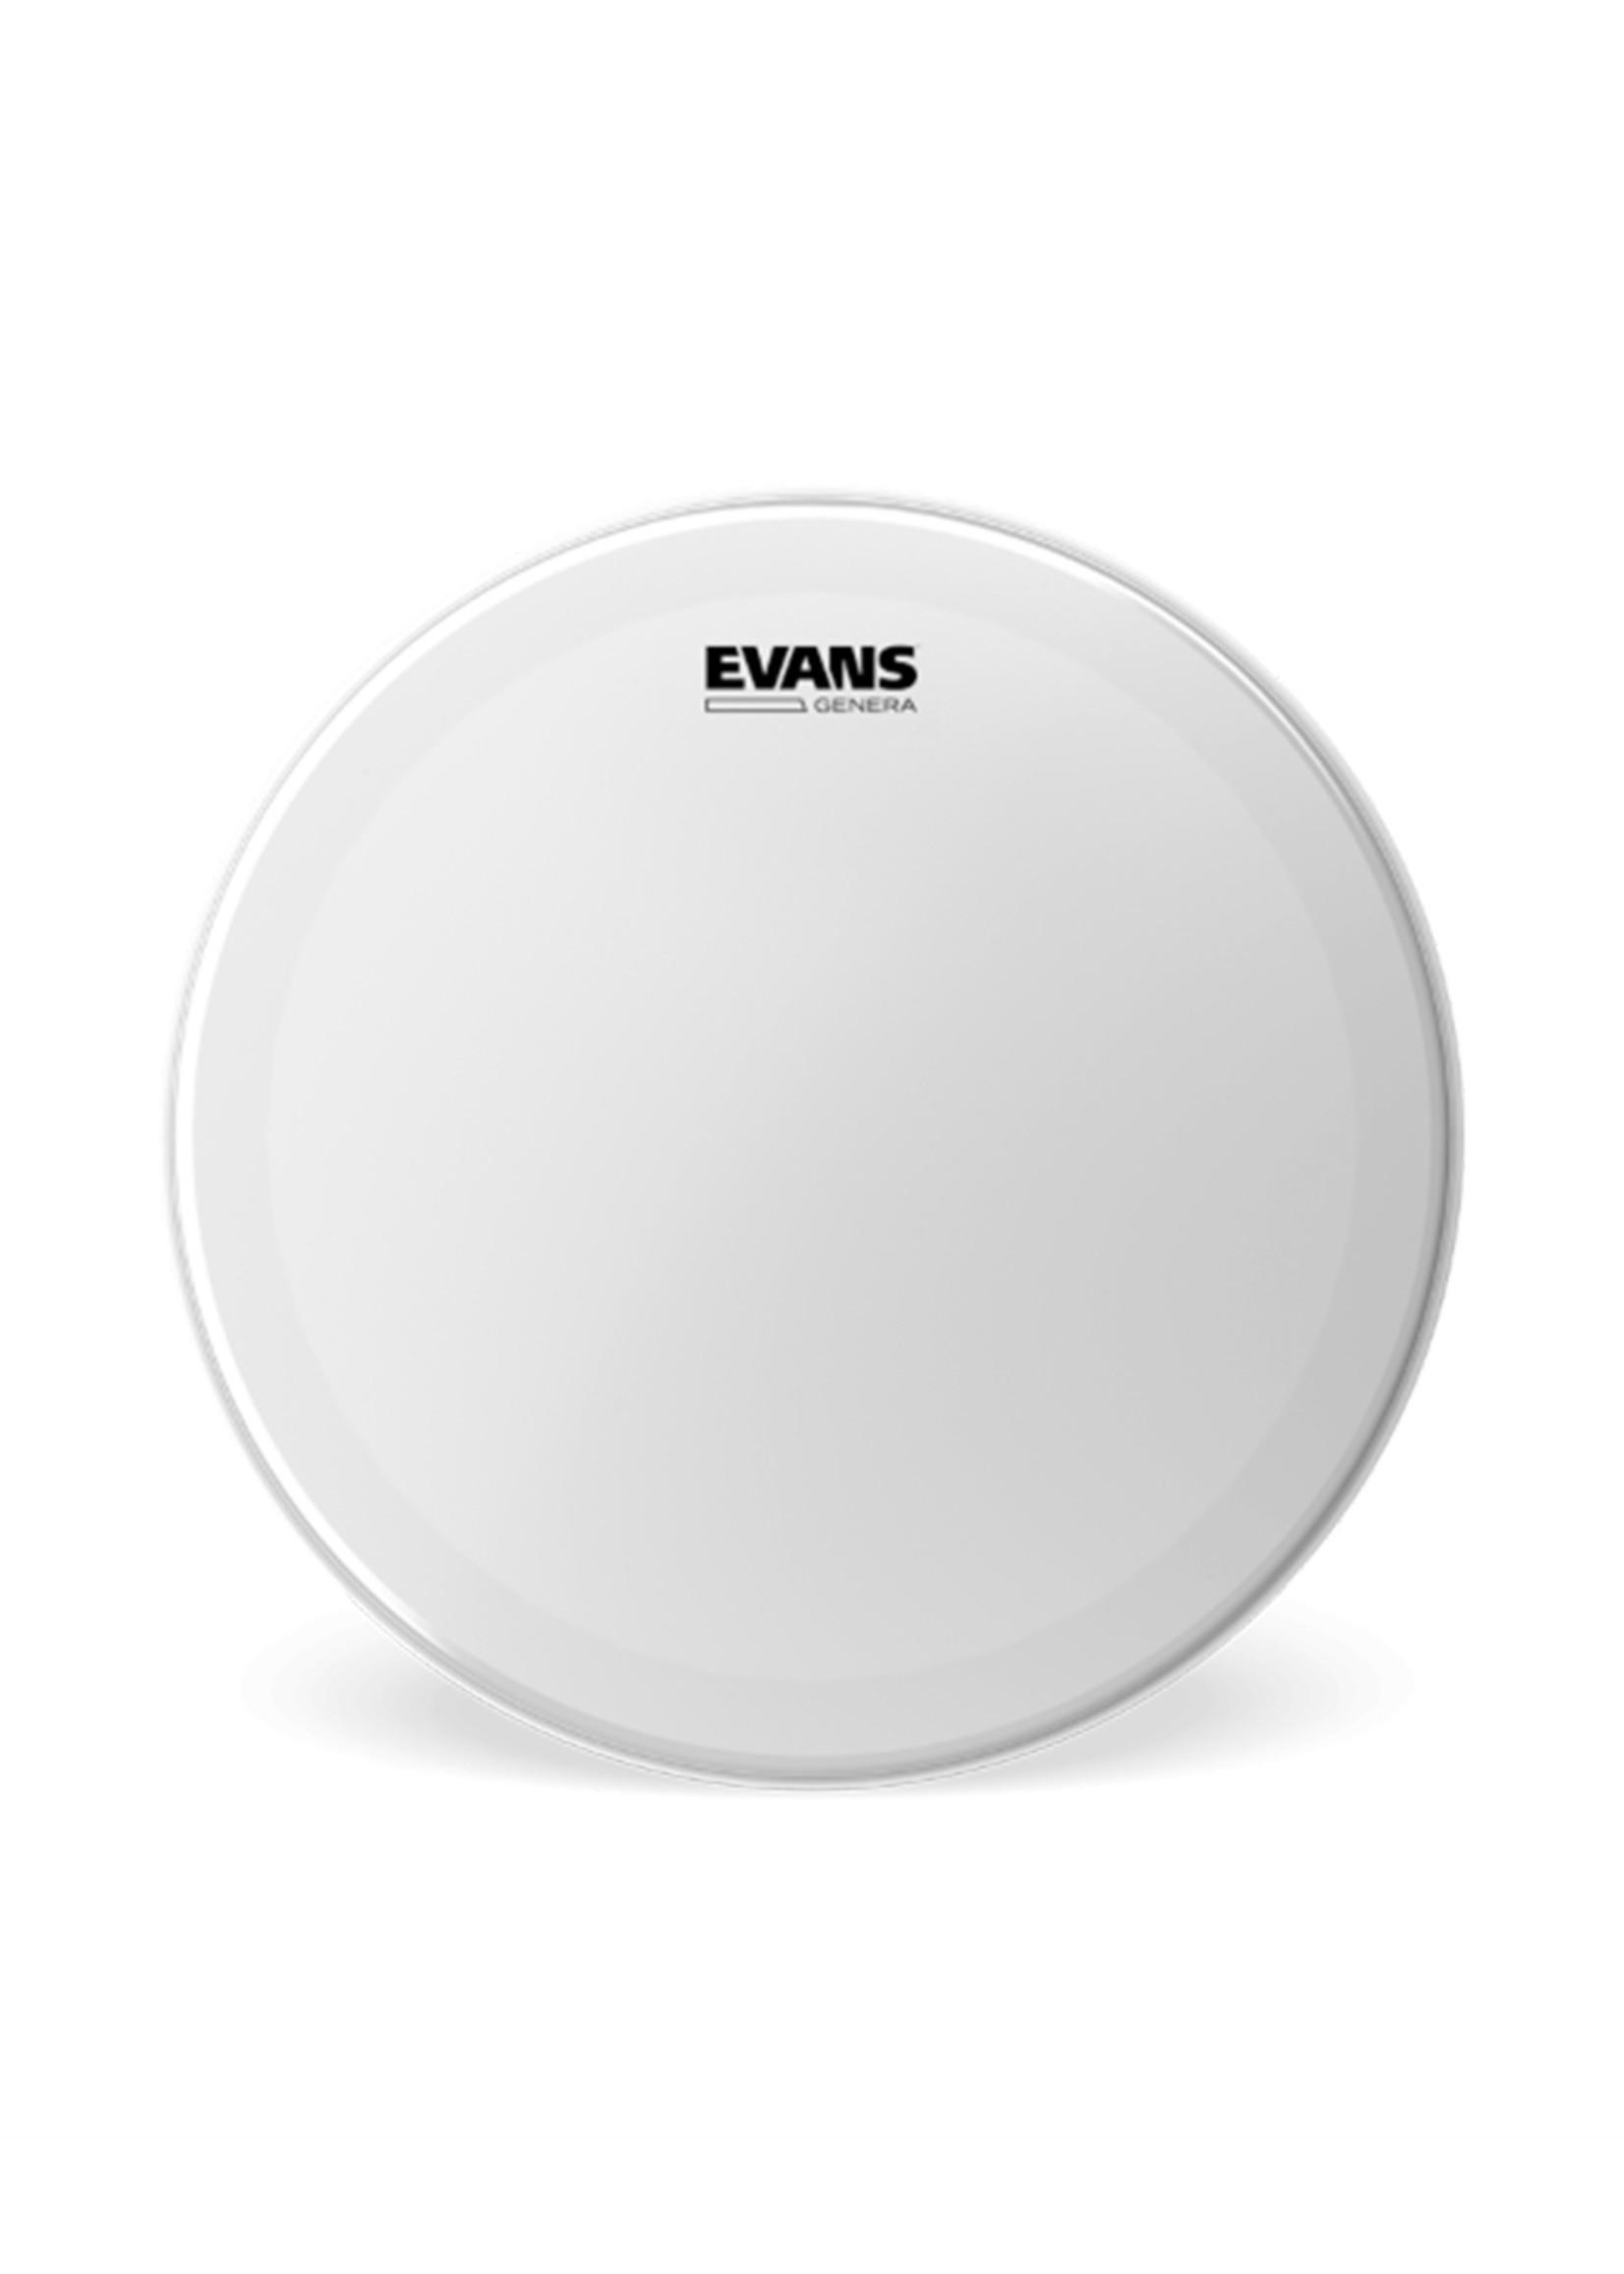 "Evans Evans 14"" Genera"